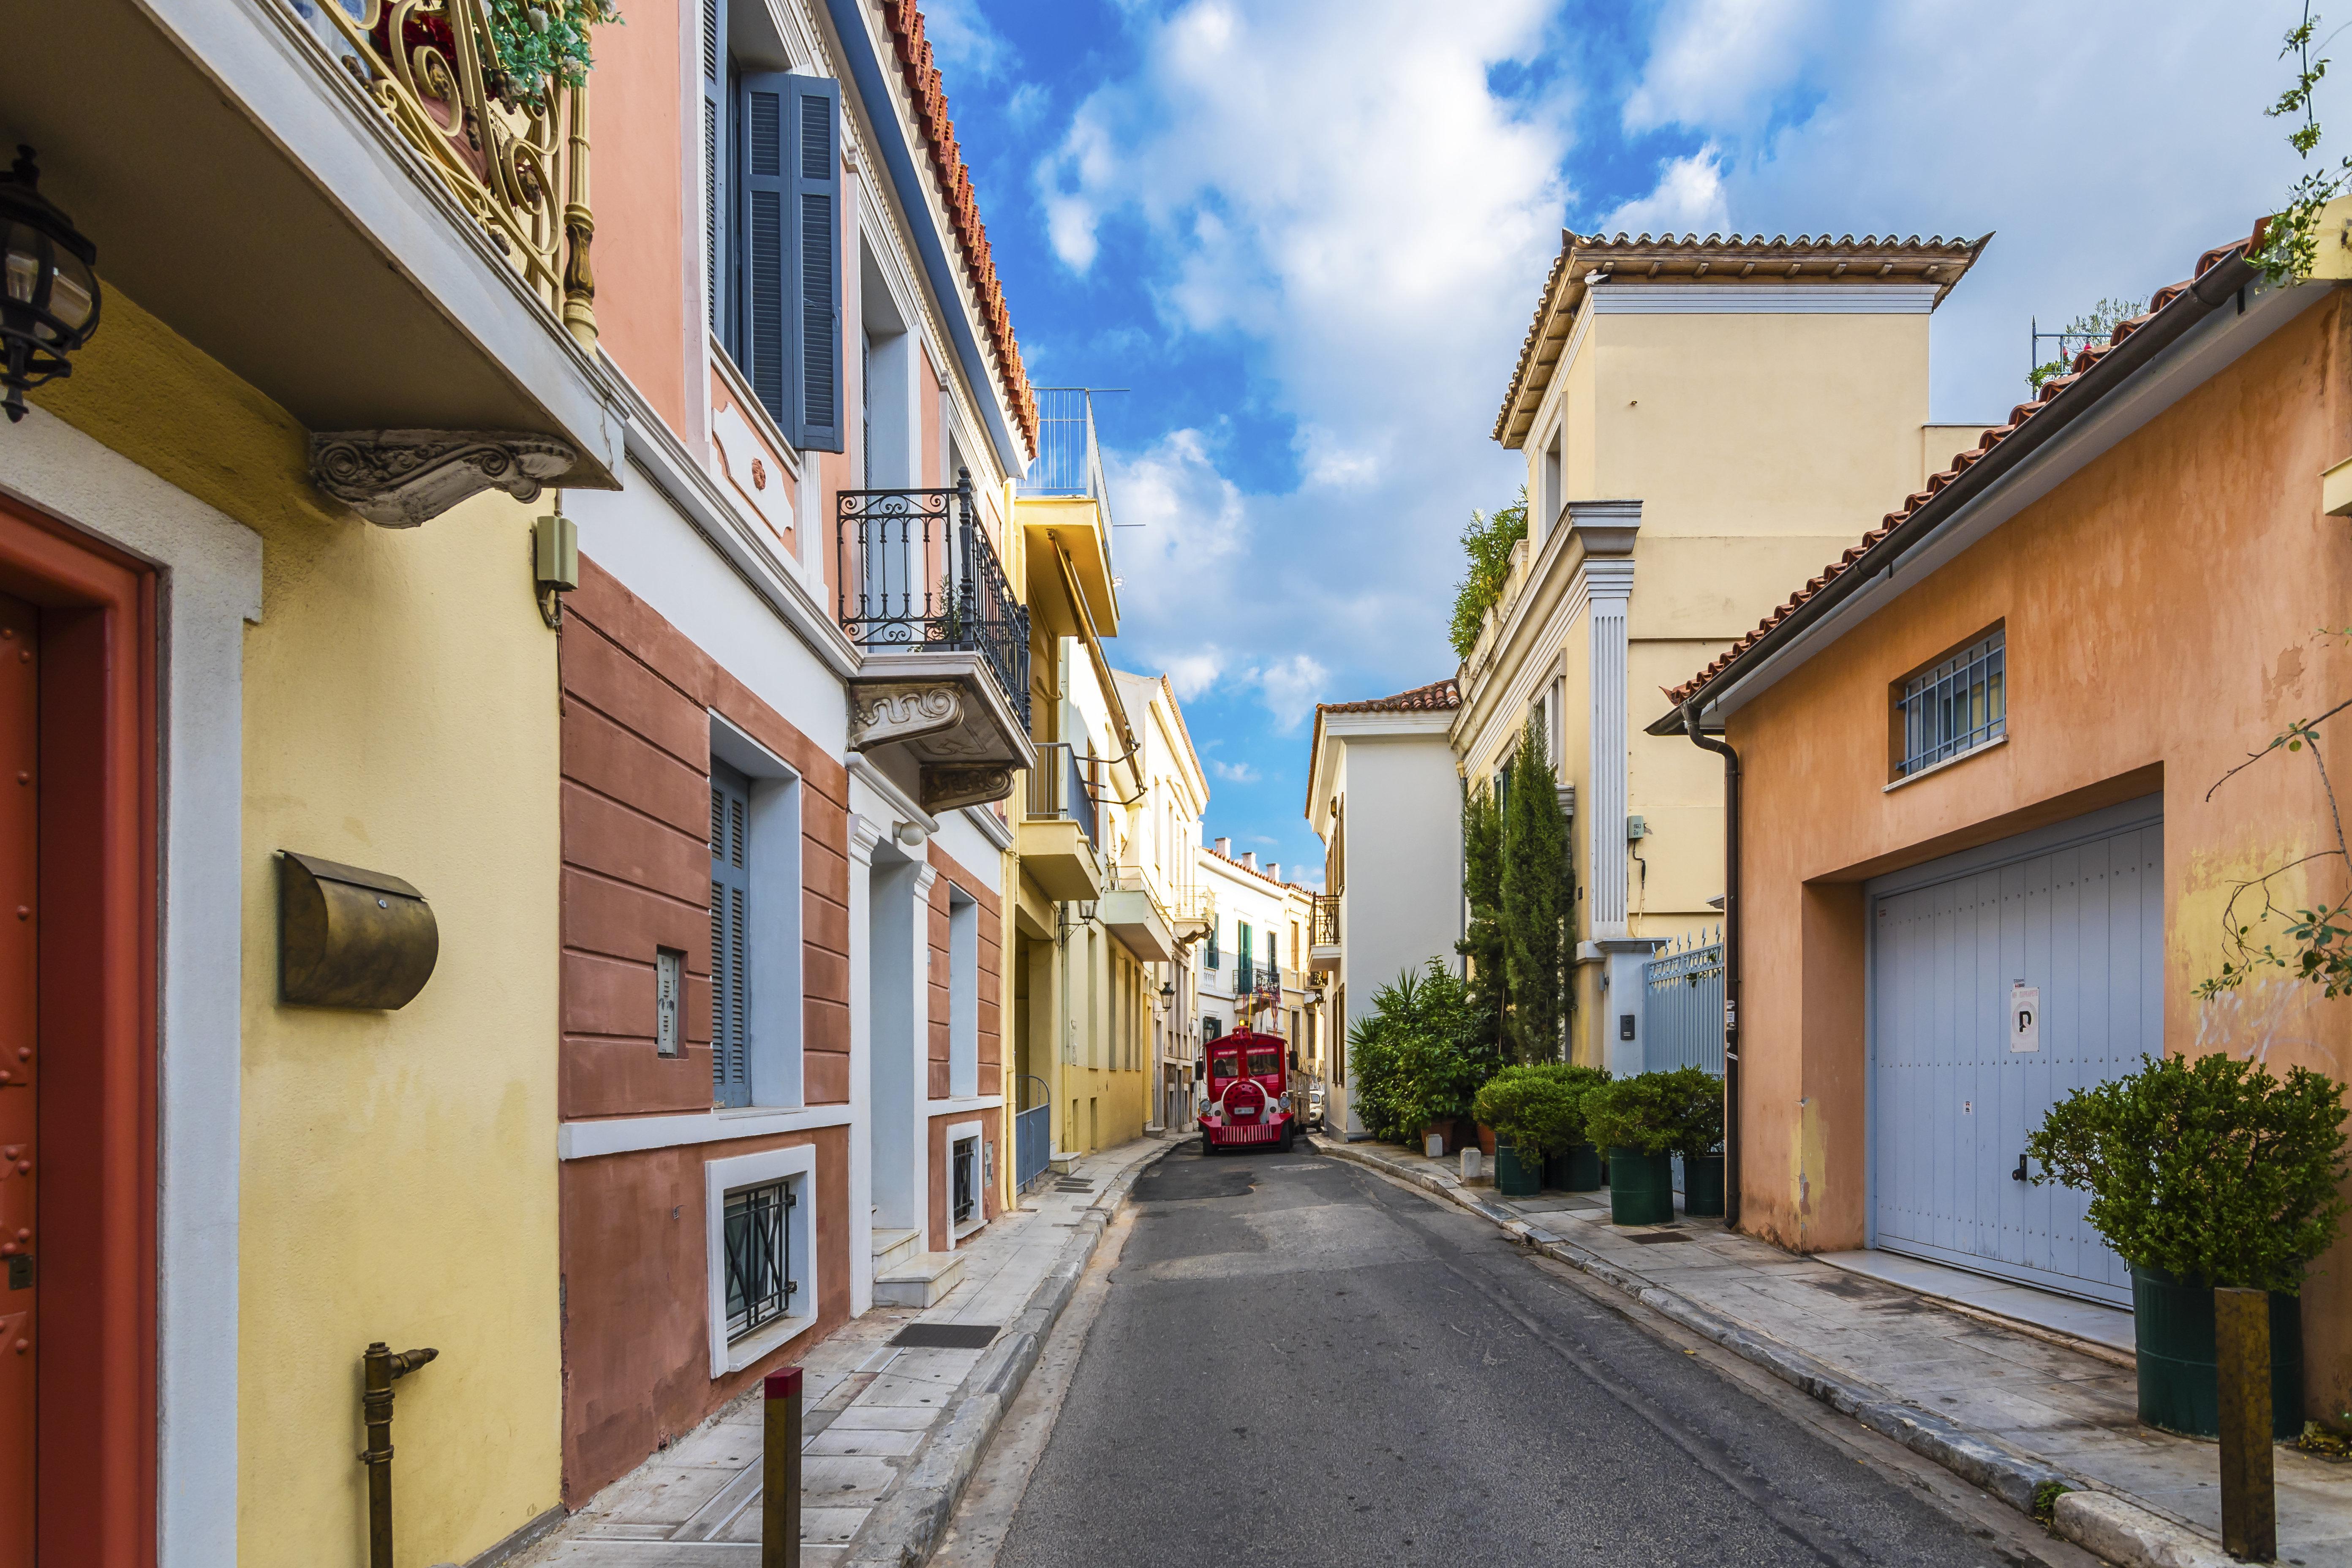 Airbnb: Οι τοπ γειτονιές της Αθήνας στη μίσθωση σπιτιών